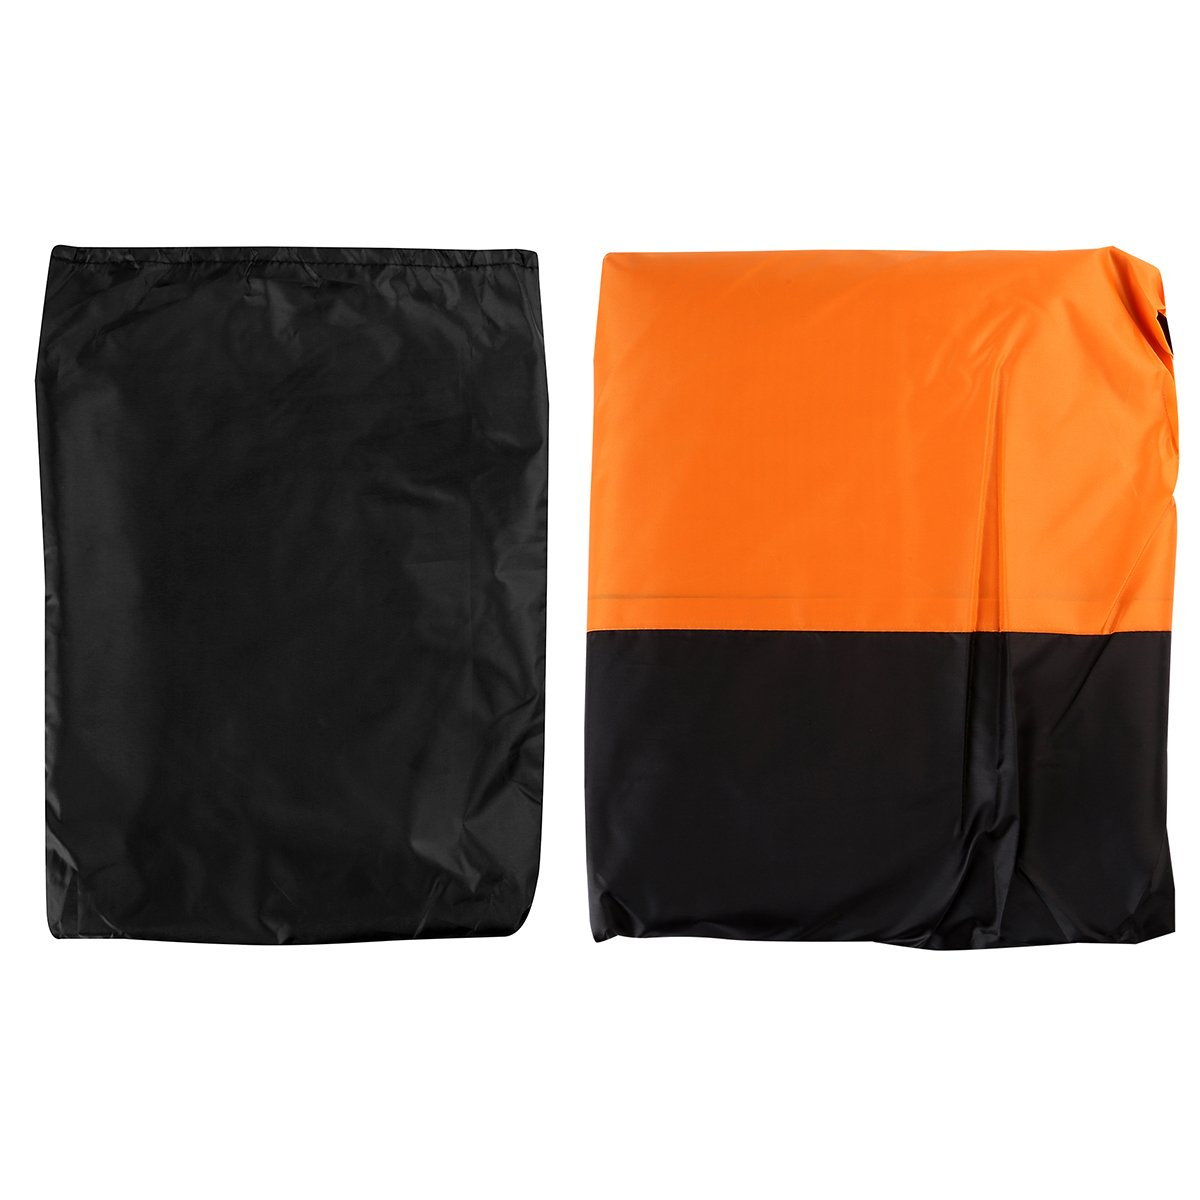 LEANINGTECH All Season Black&Orange Waterproof Sun Motorcycle cover, Fits up to 108'' Harley Davison, Honda, Suzuki, Kawasaki, Yamaha,Street Glide Touring and More (XX Large)